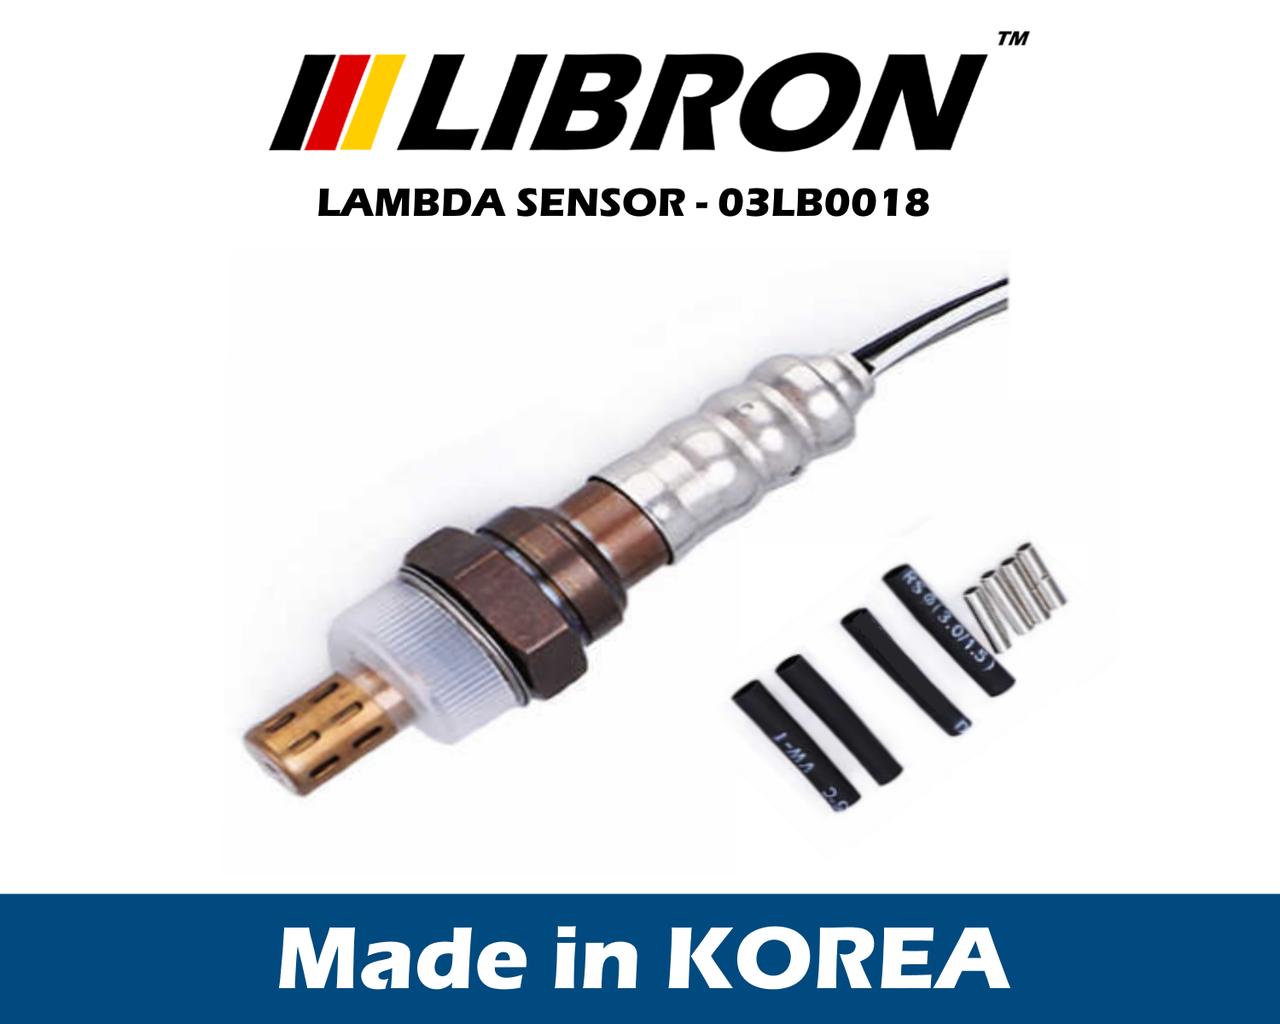 Лямбда зонд Libron 03LB0018 - Ford MONDEO III (B5Y)